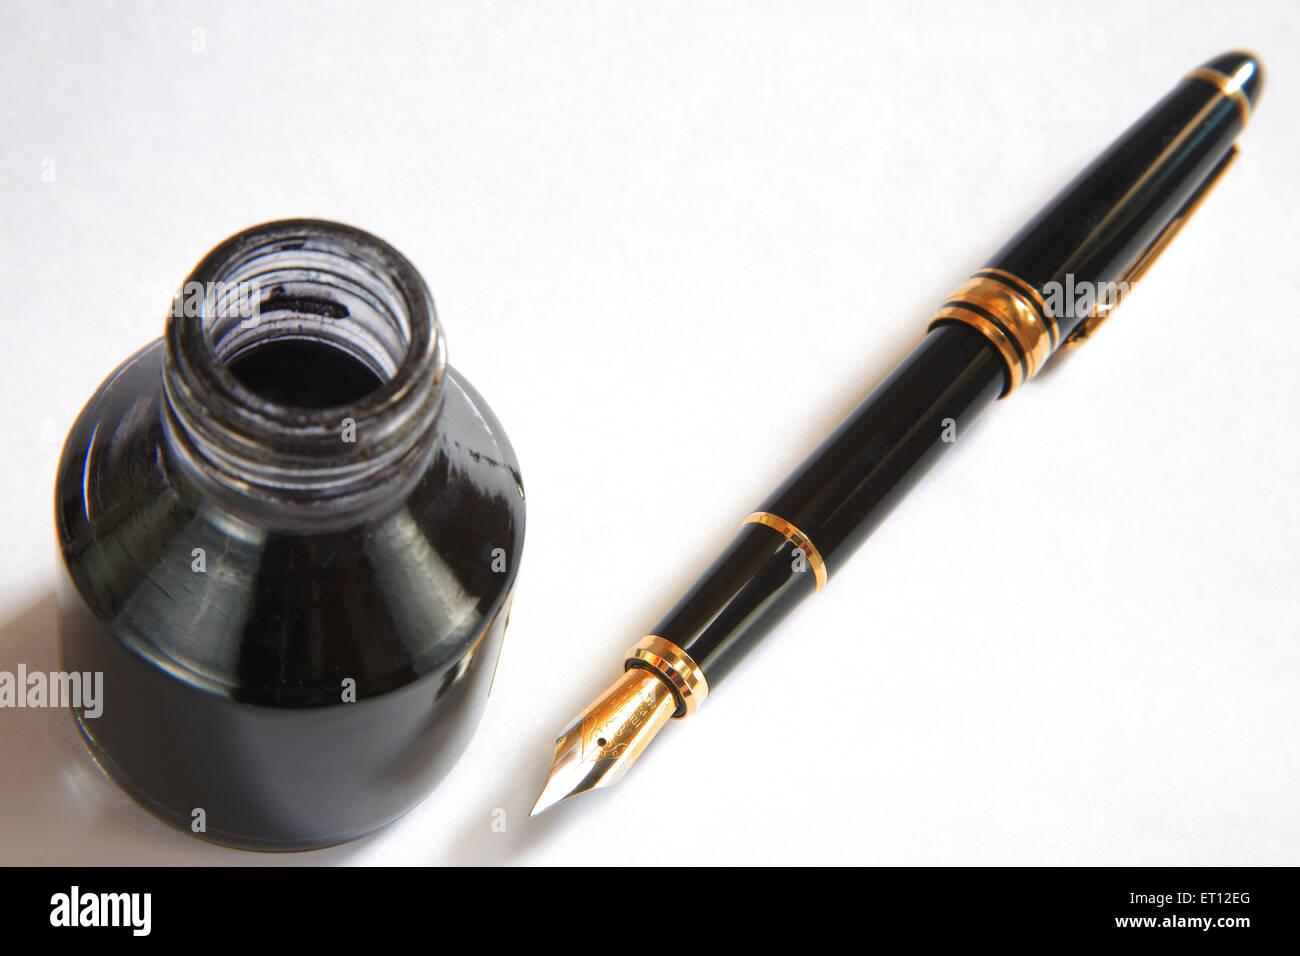 Writing instrument ; kalam davat ; inkpen and inkpot ; India - Stock Image